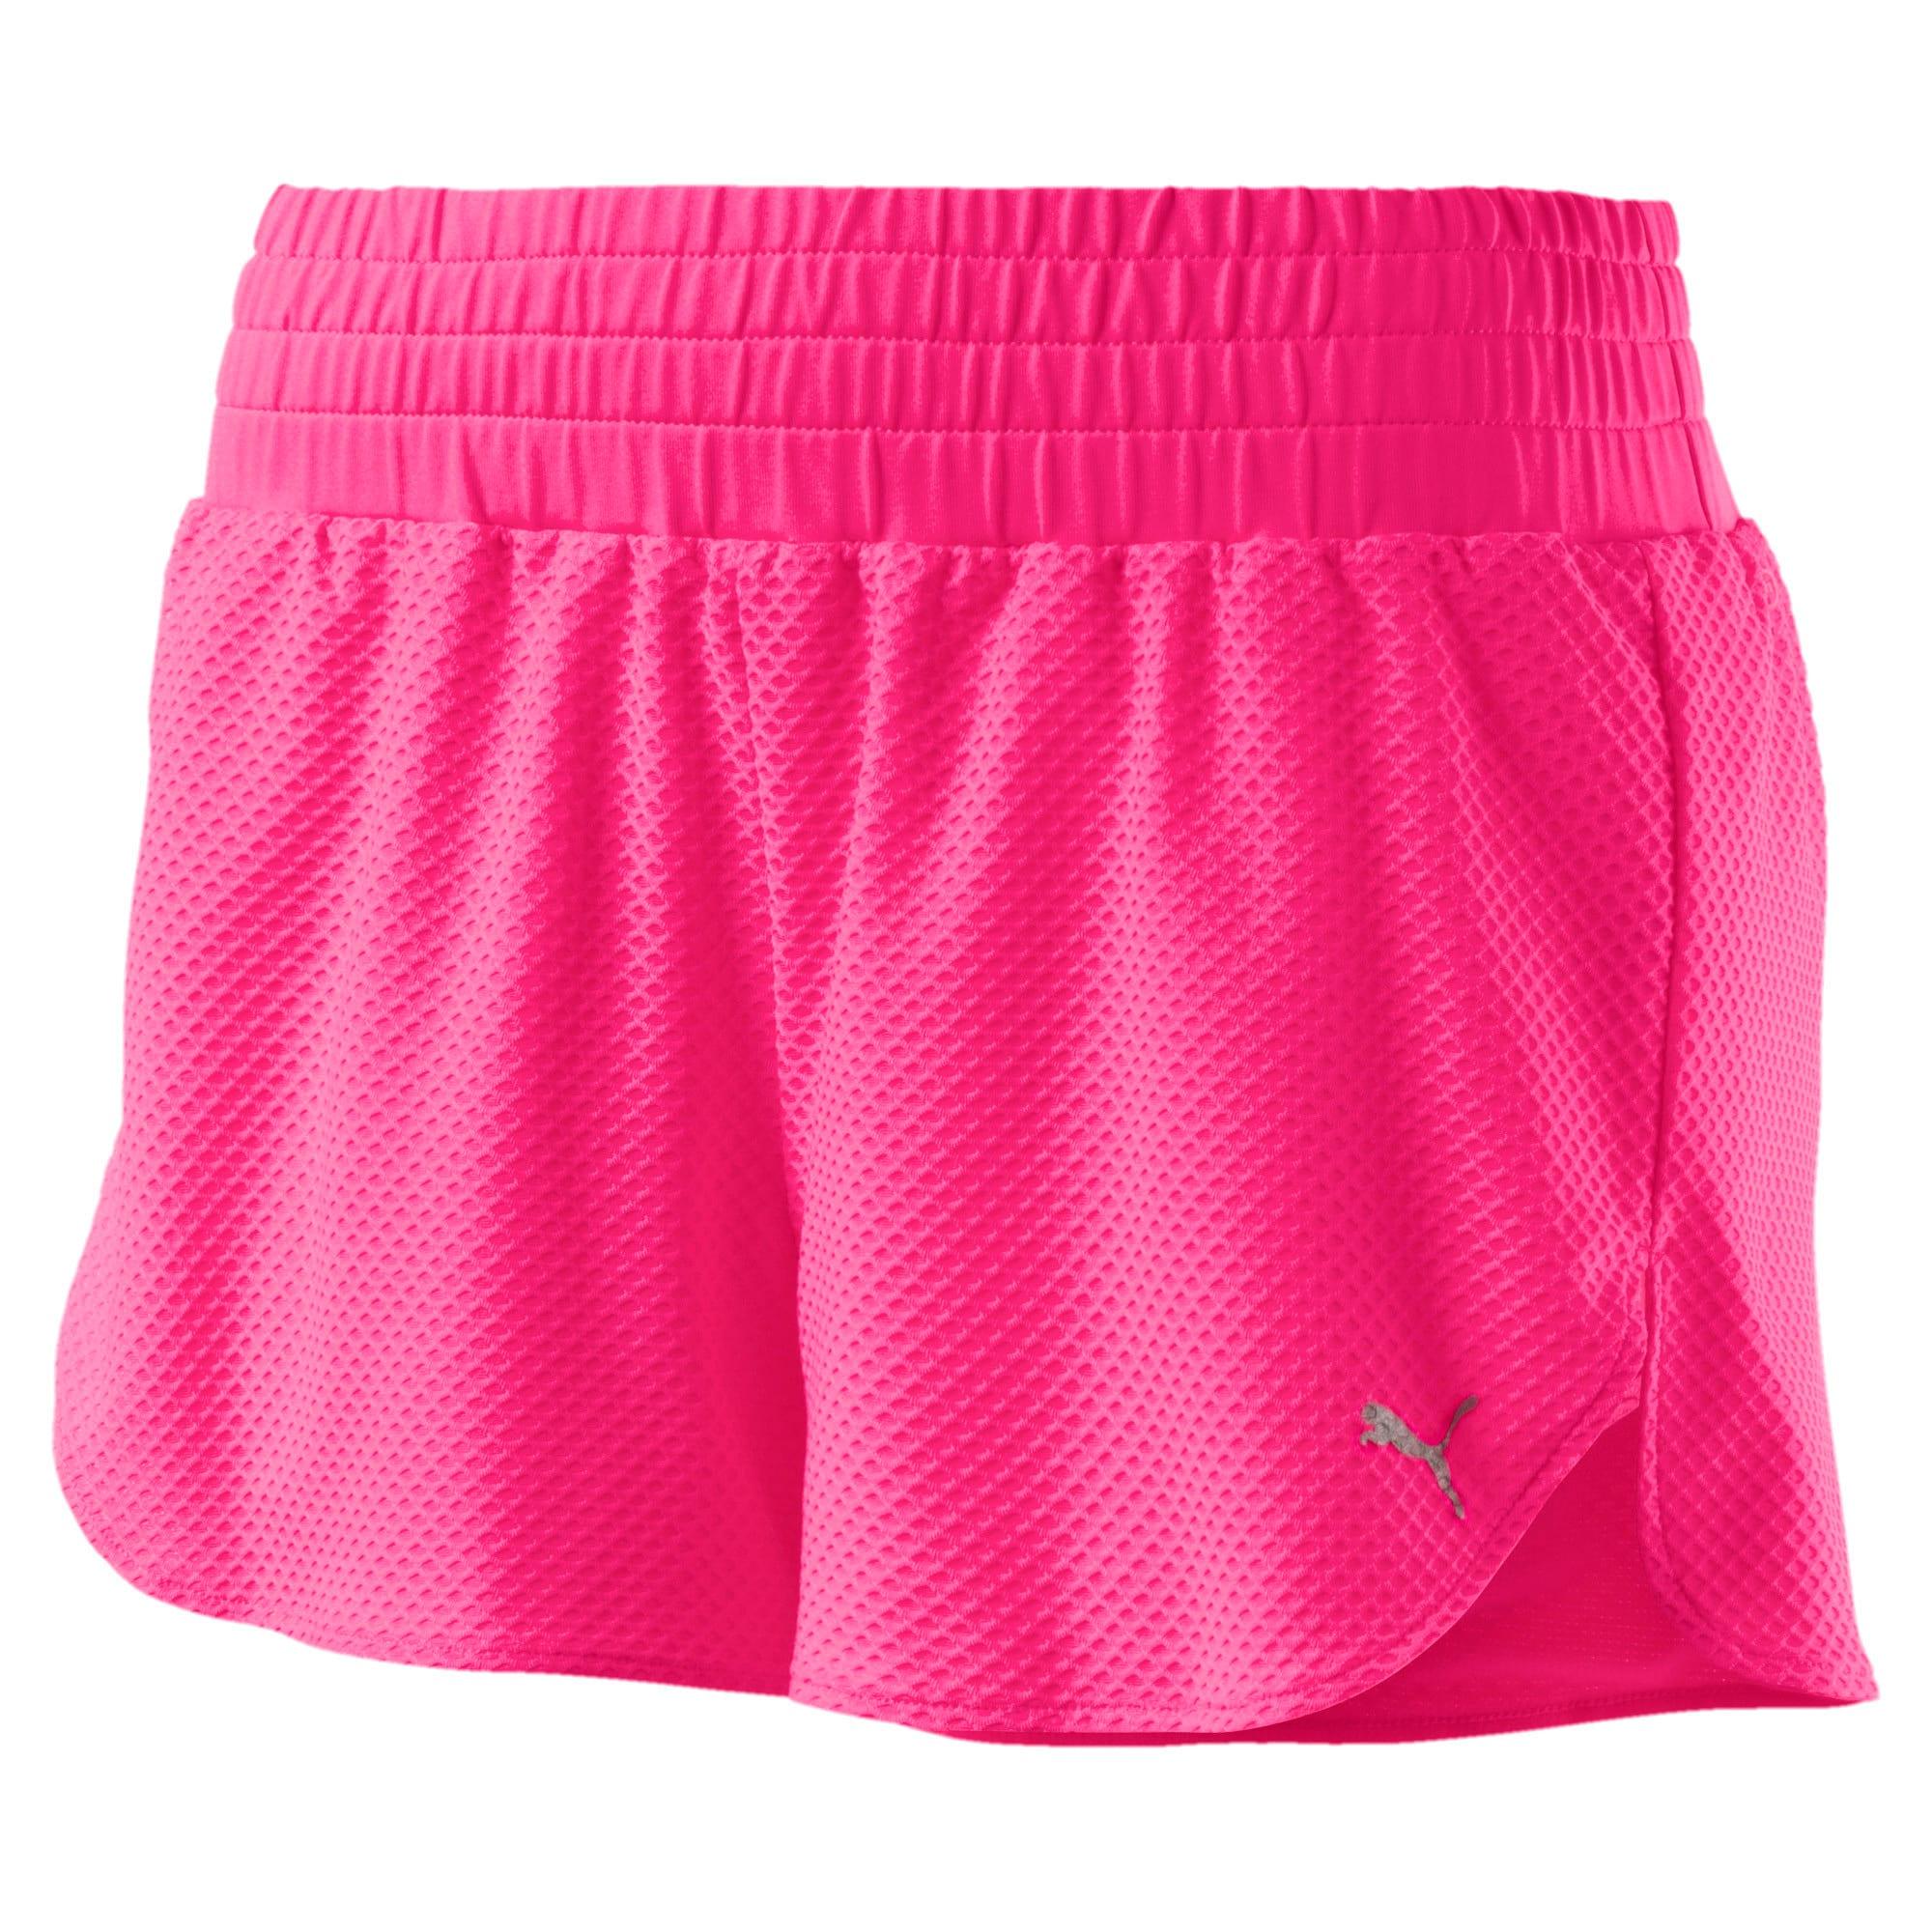 Thumbnail 3 of Active Training Women's Mesh Shorts, KNOCKOUT PINK, medium-IND